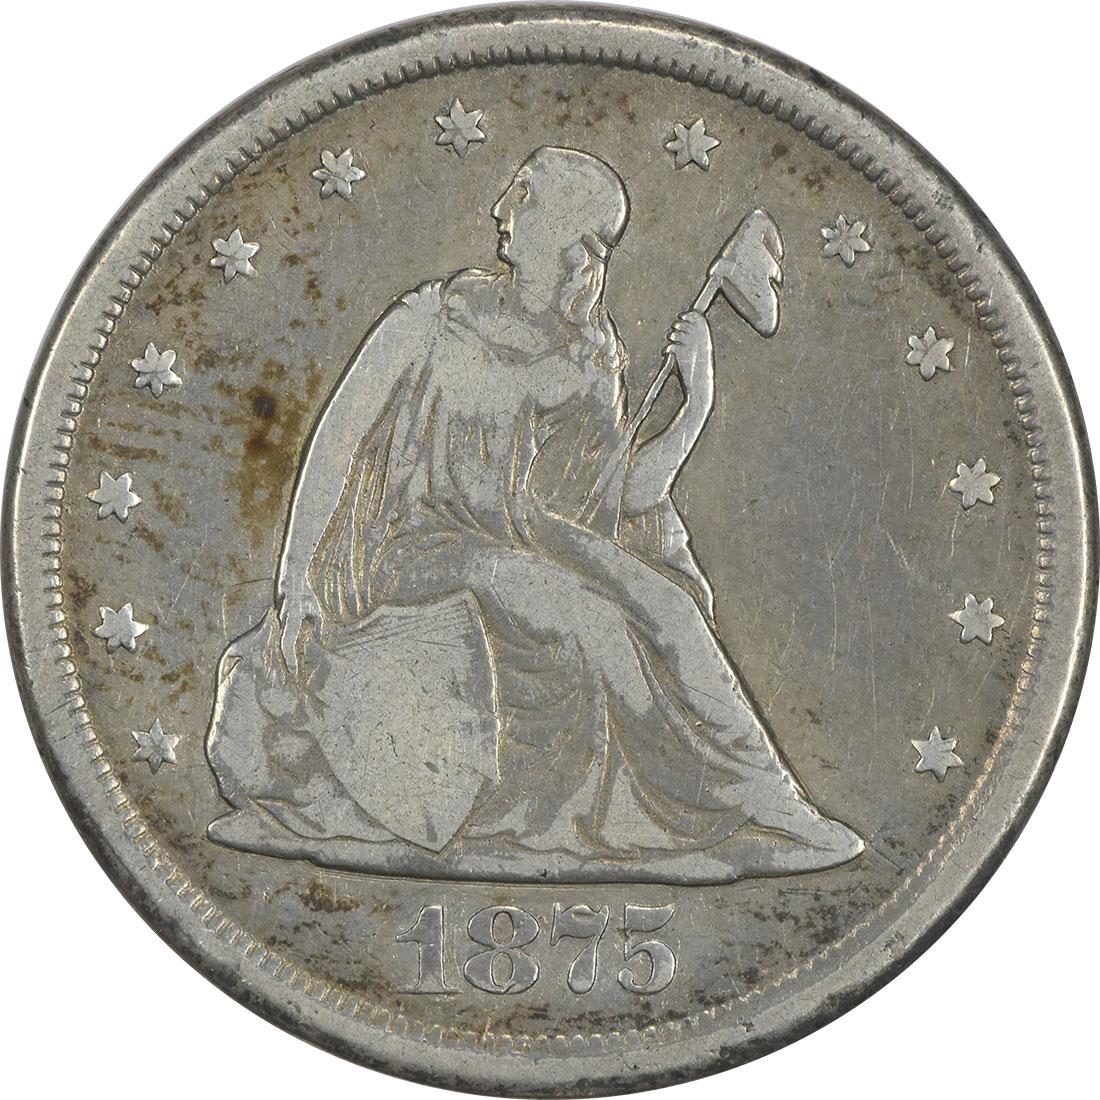 1875-CC Twenty Cent Silver Piece F Uncertified #154